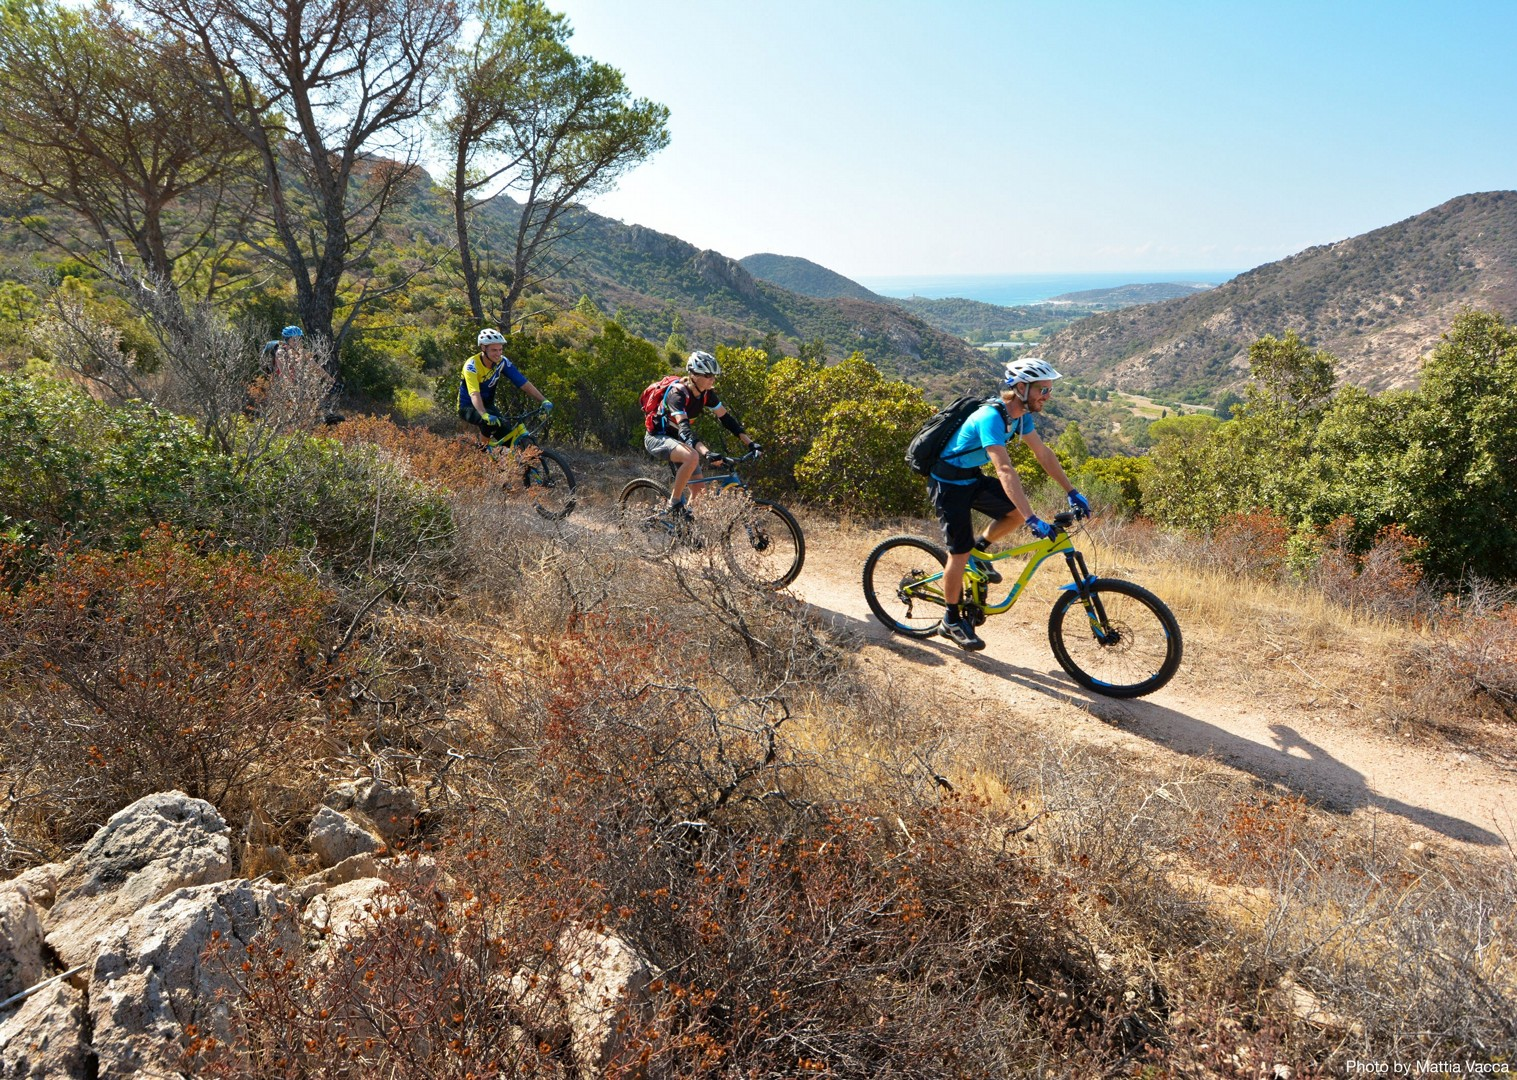 guided-mountain-bike-holiday-italy-sardinia-sardinian-enduro.jpg - Sardinia - Sardinian Enduro - Italia Mountain Biking